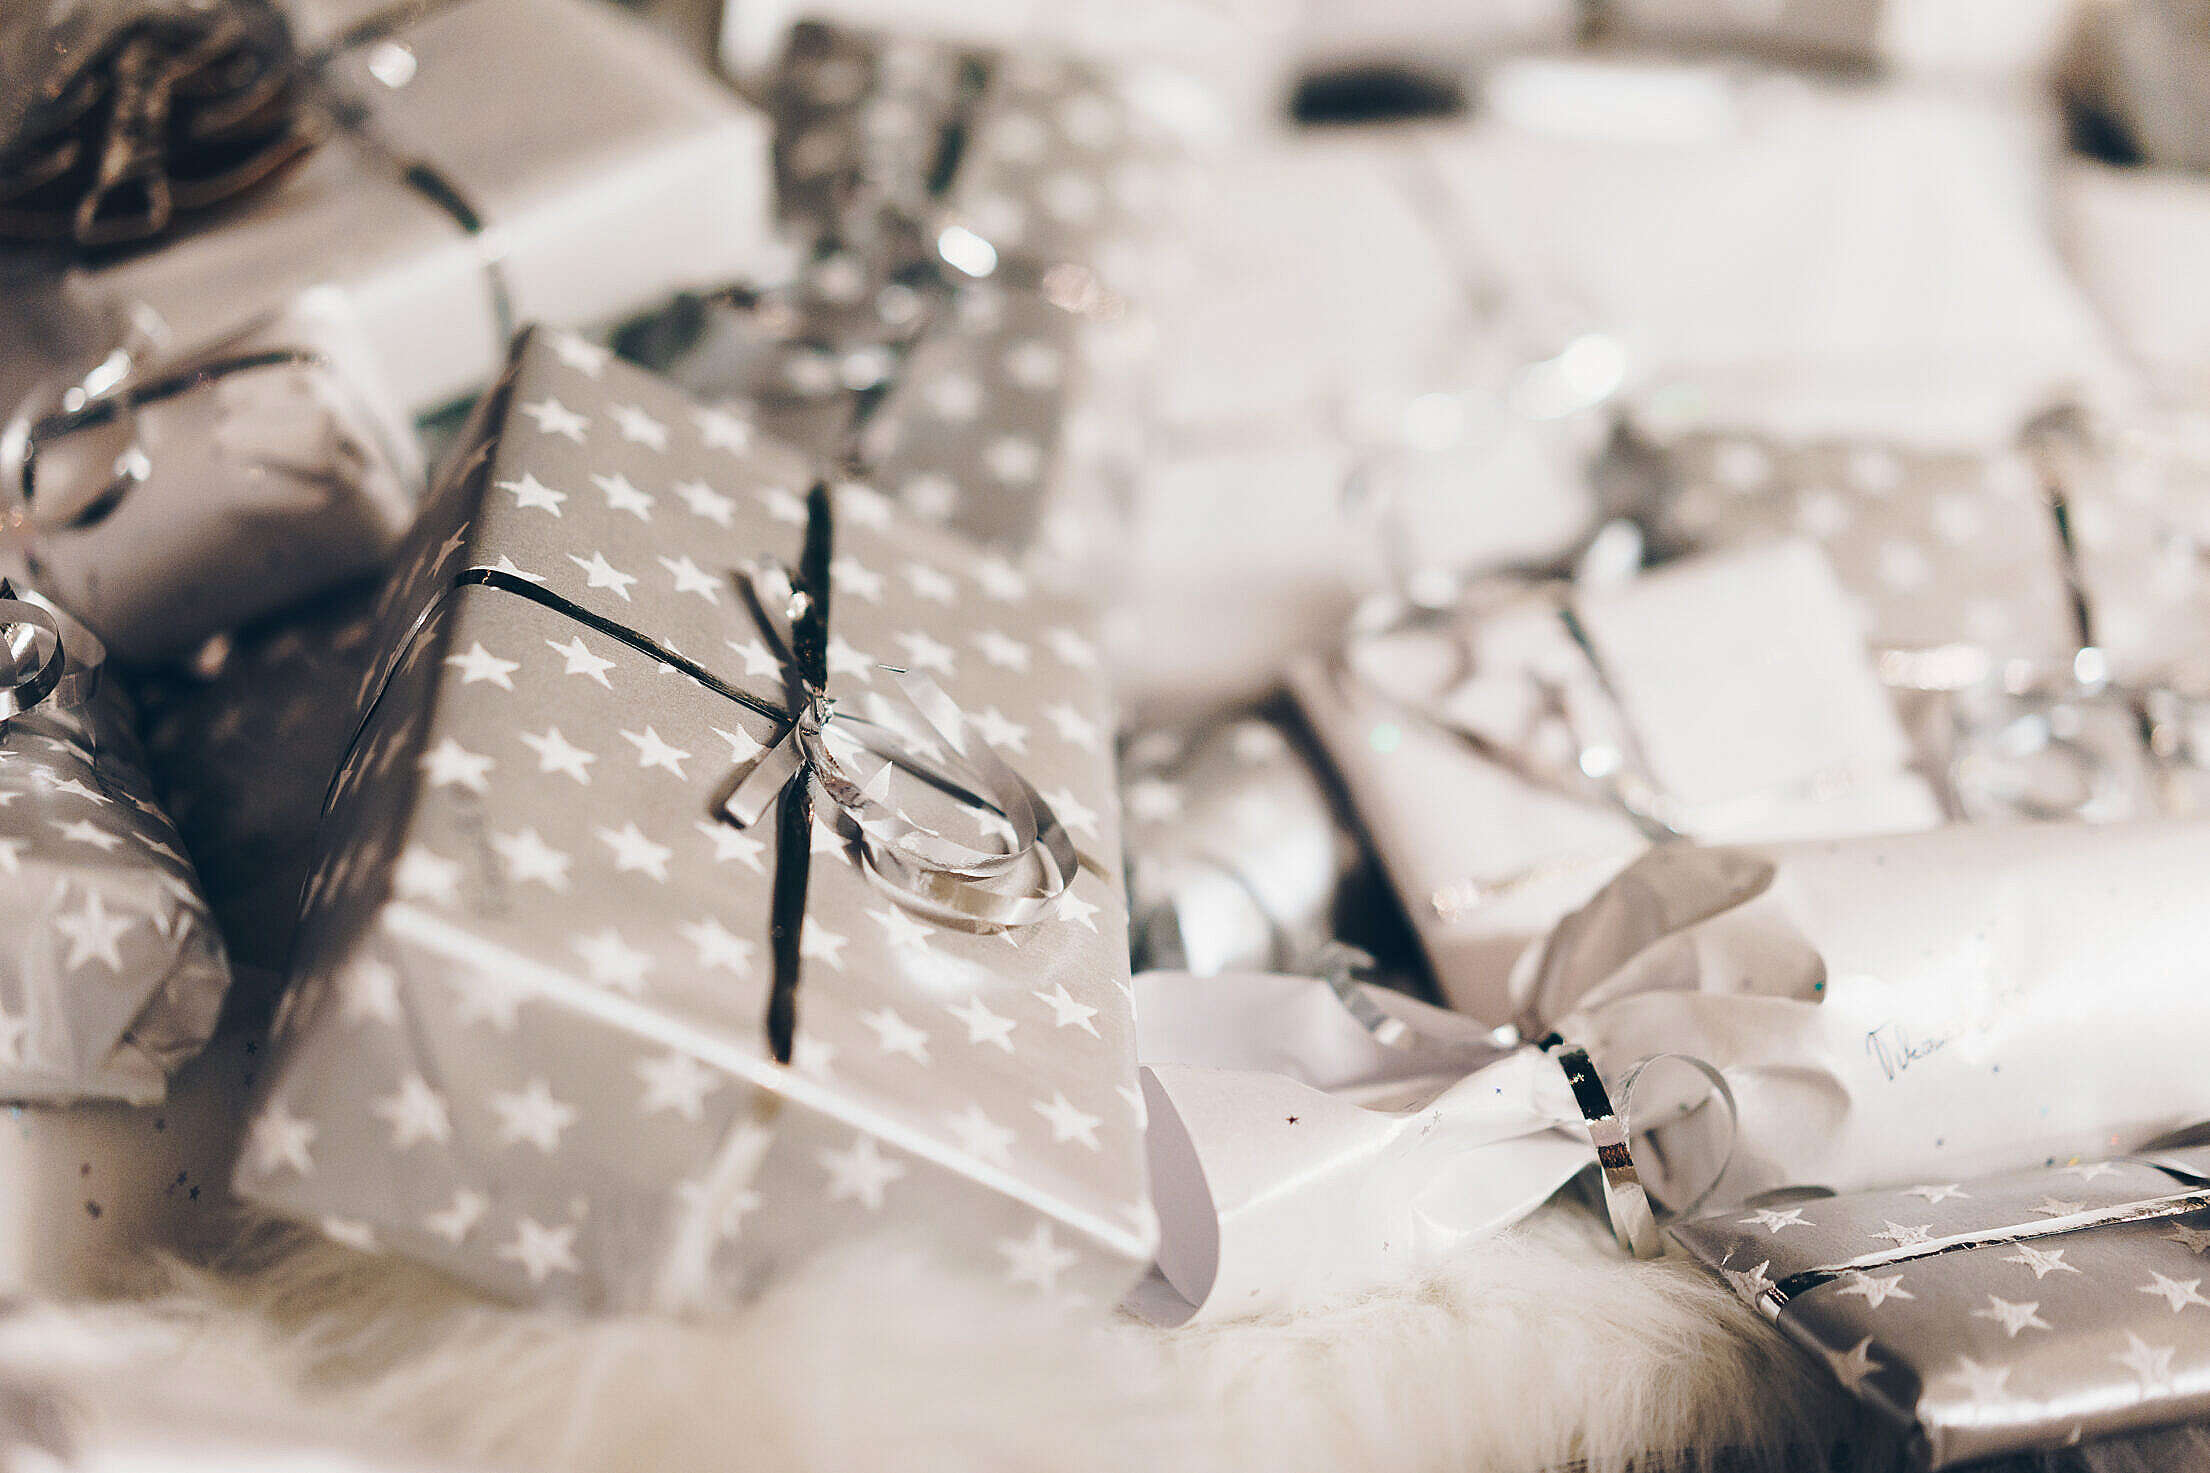 Silver Christmas Presents Free Stock Photo